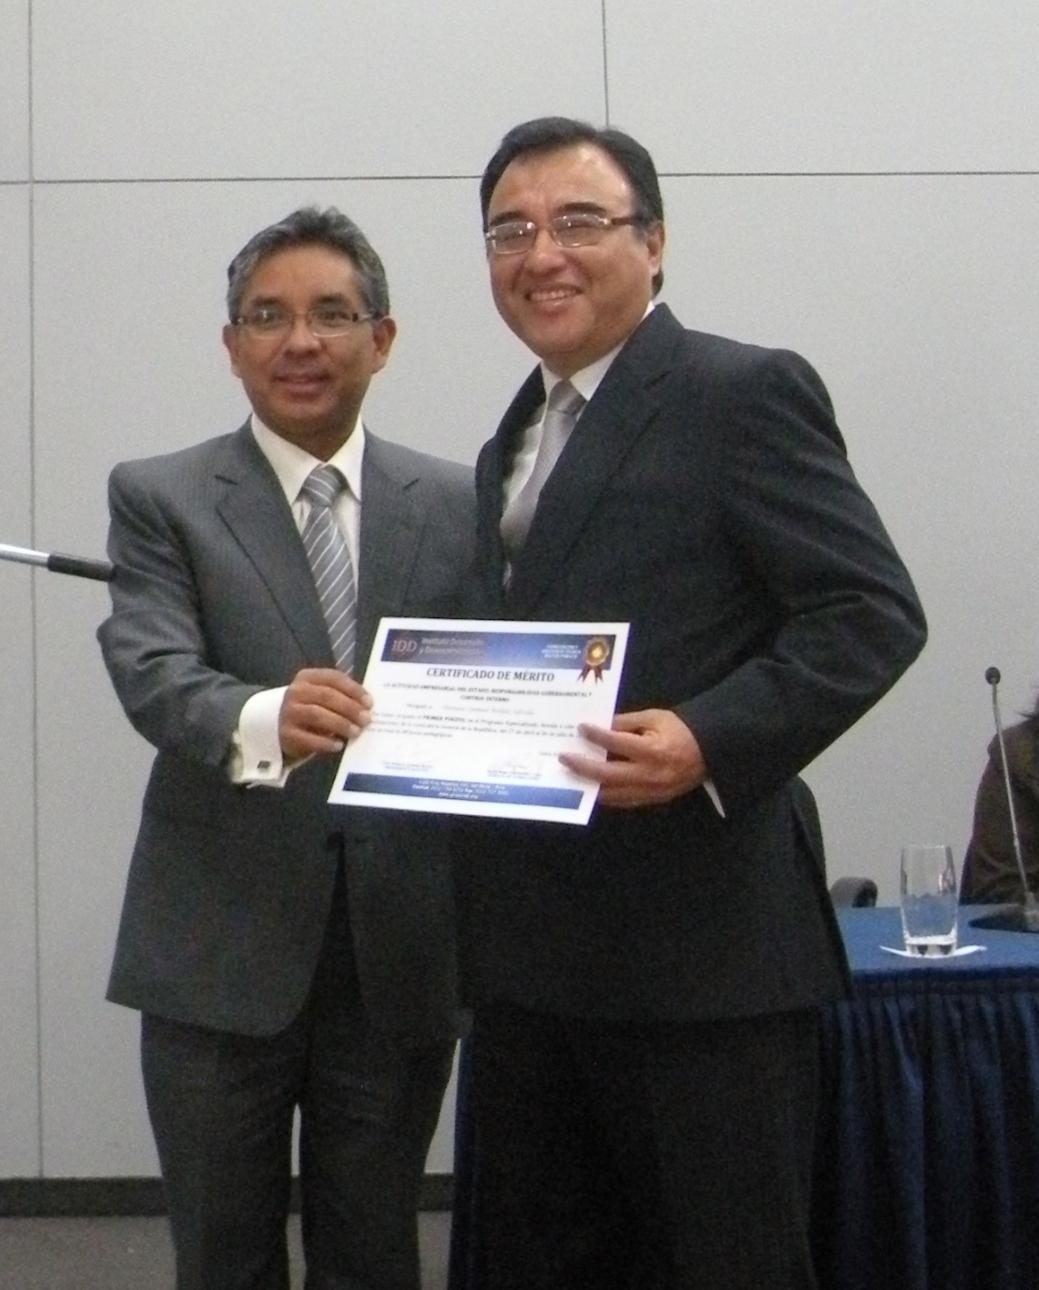 Samuel Bellido (derecha) recibe su diploma de manos de Robert Jiménez Murillo, Presidente Ejecutivo del IDD.